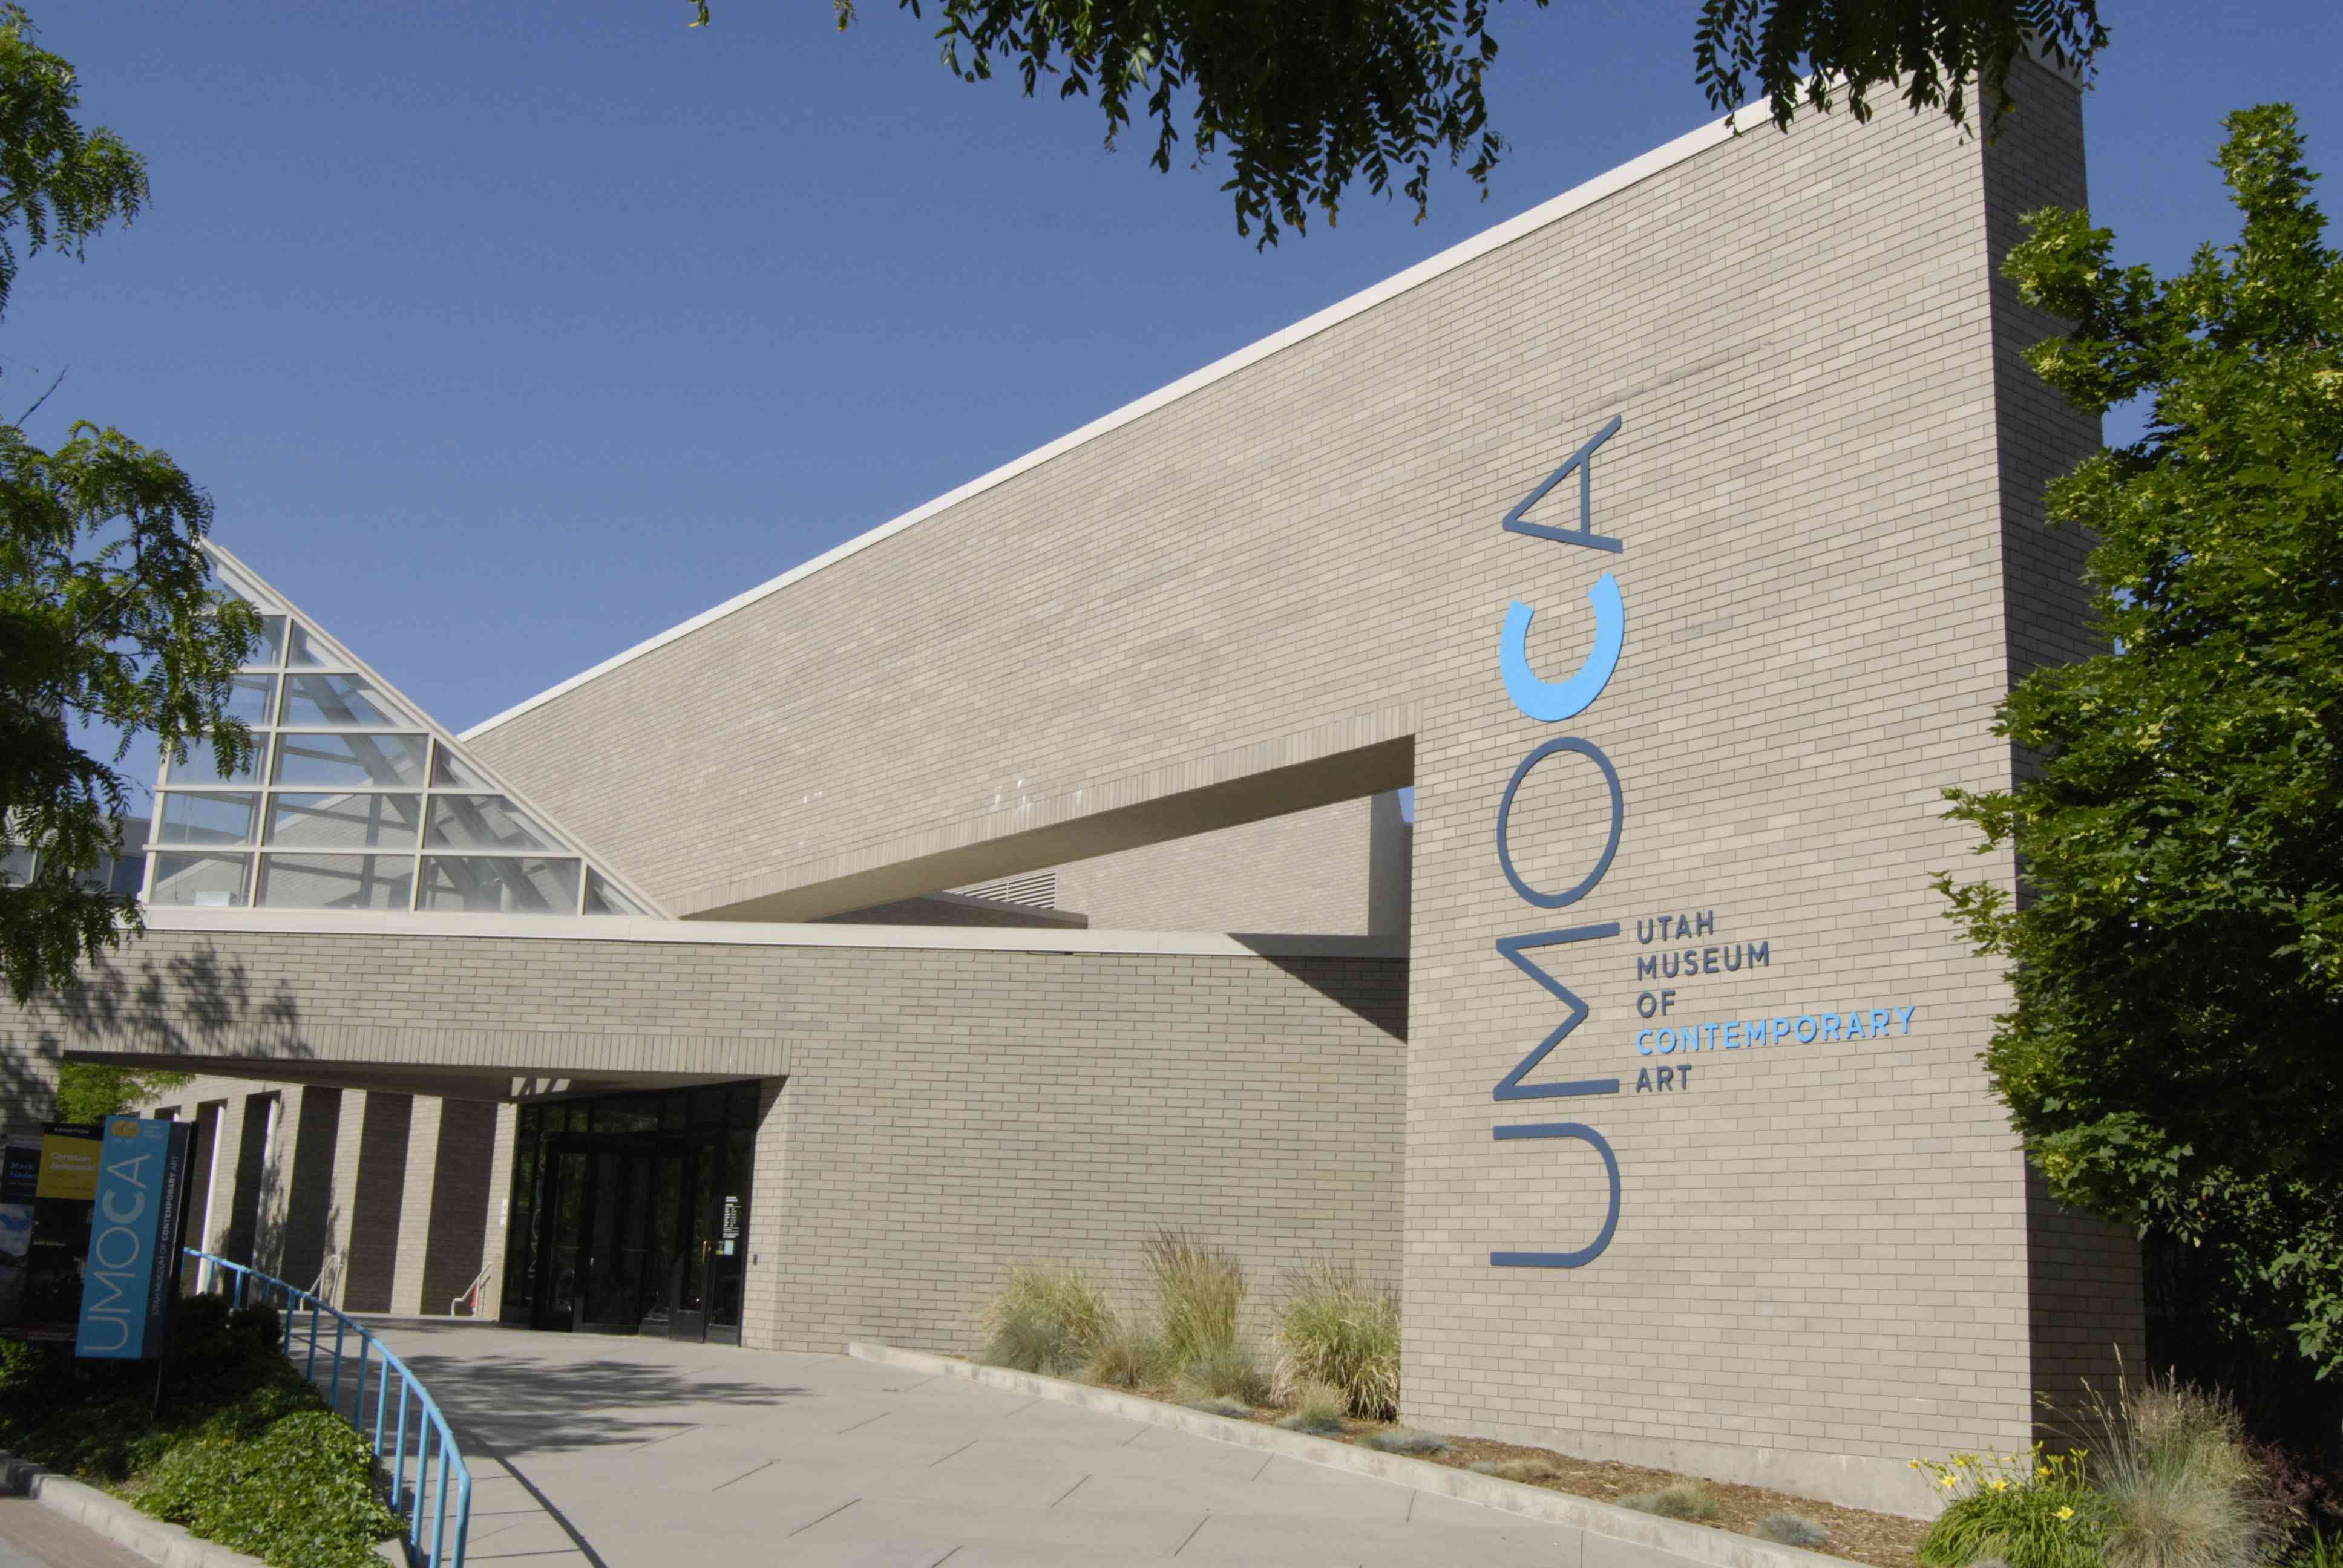 UMOCA Utha Museum of Contemporary Art salt lake city Utha